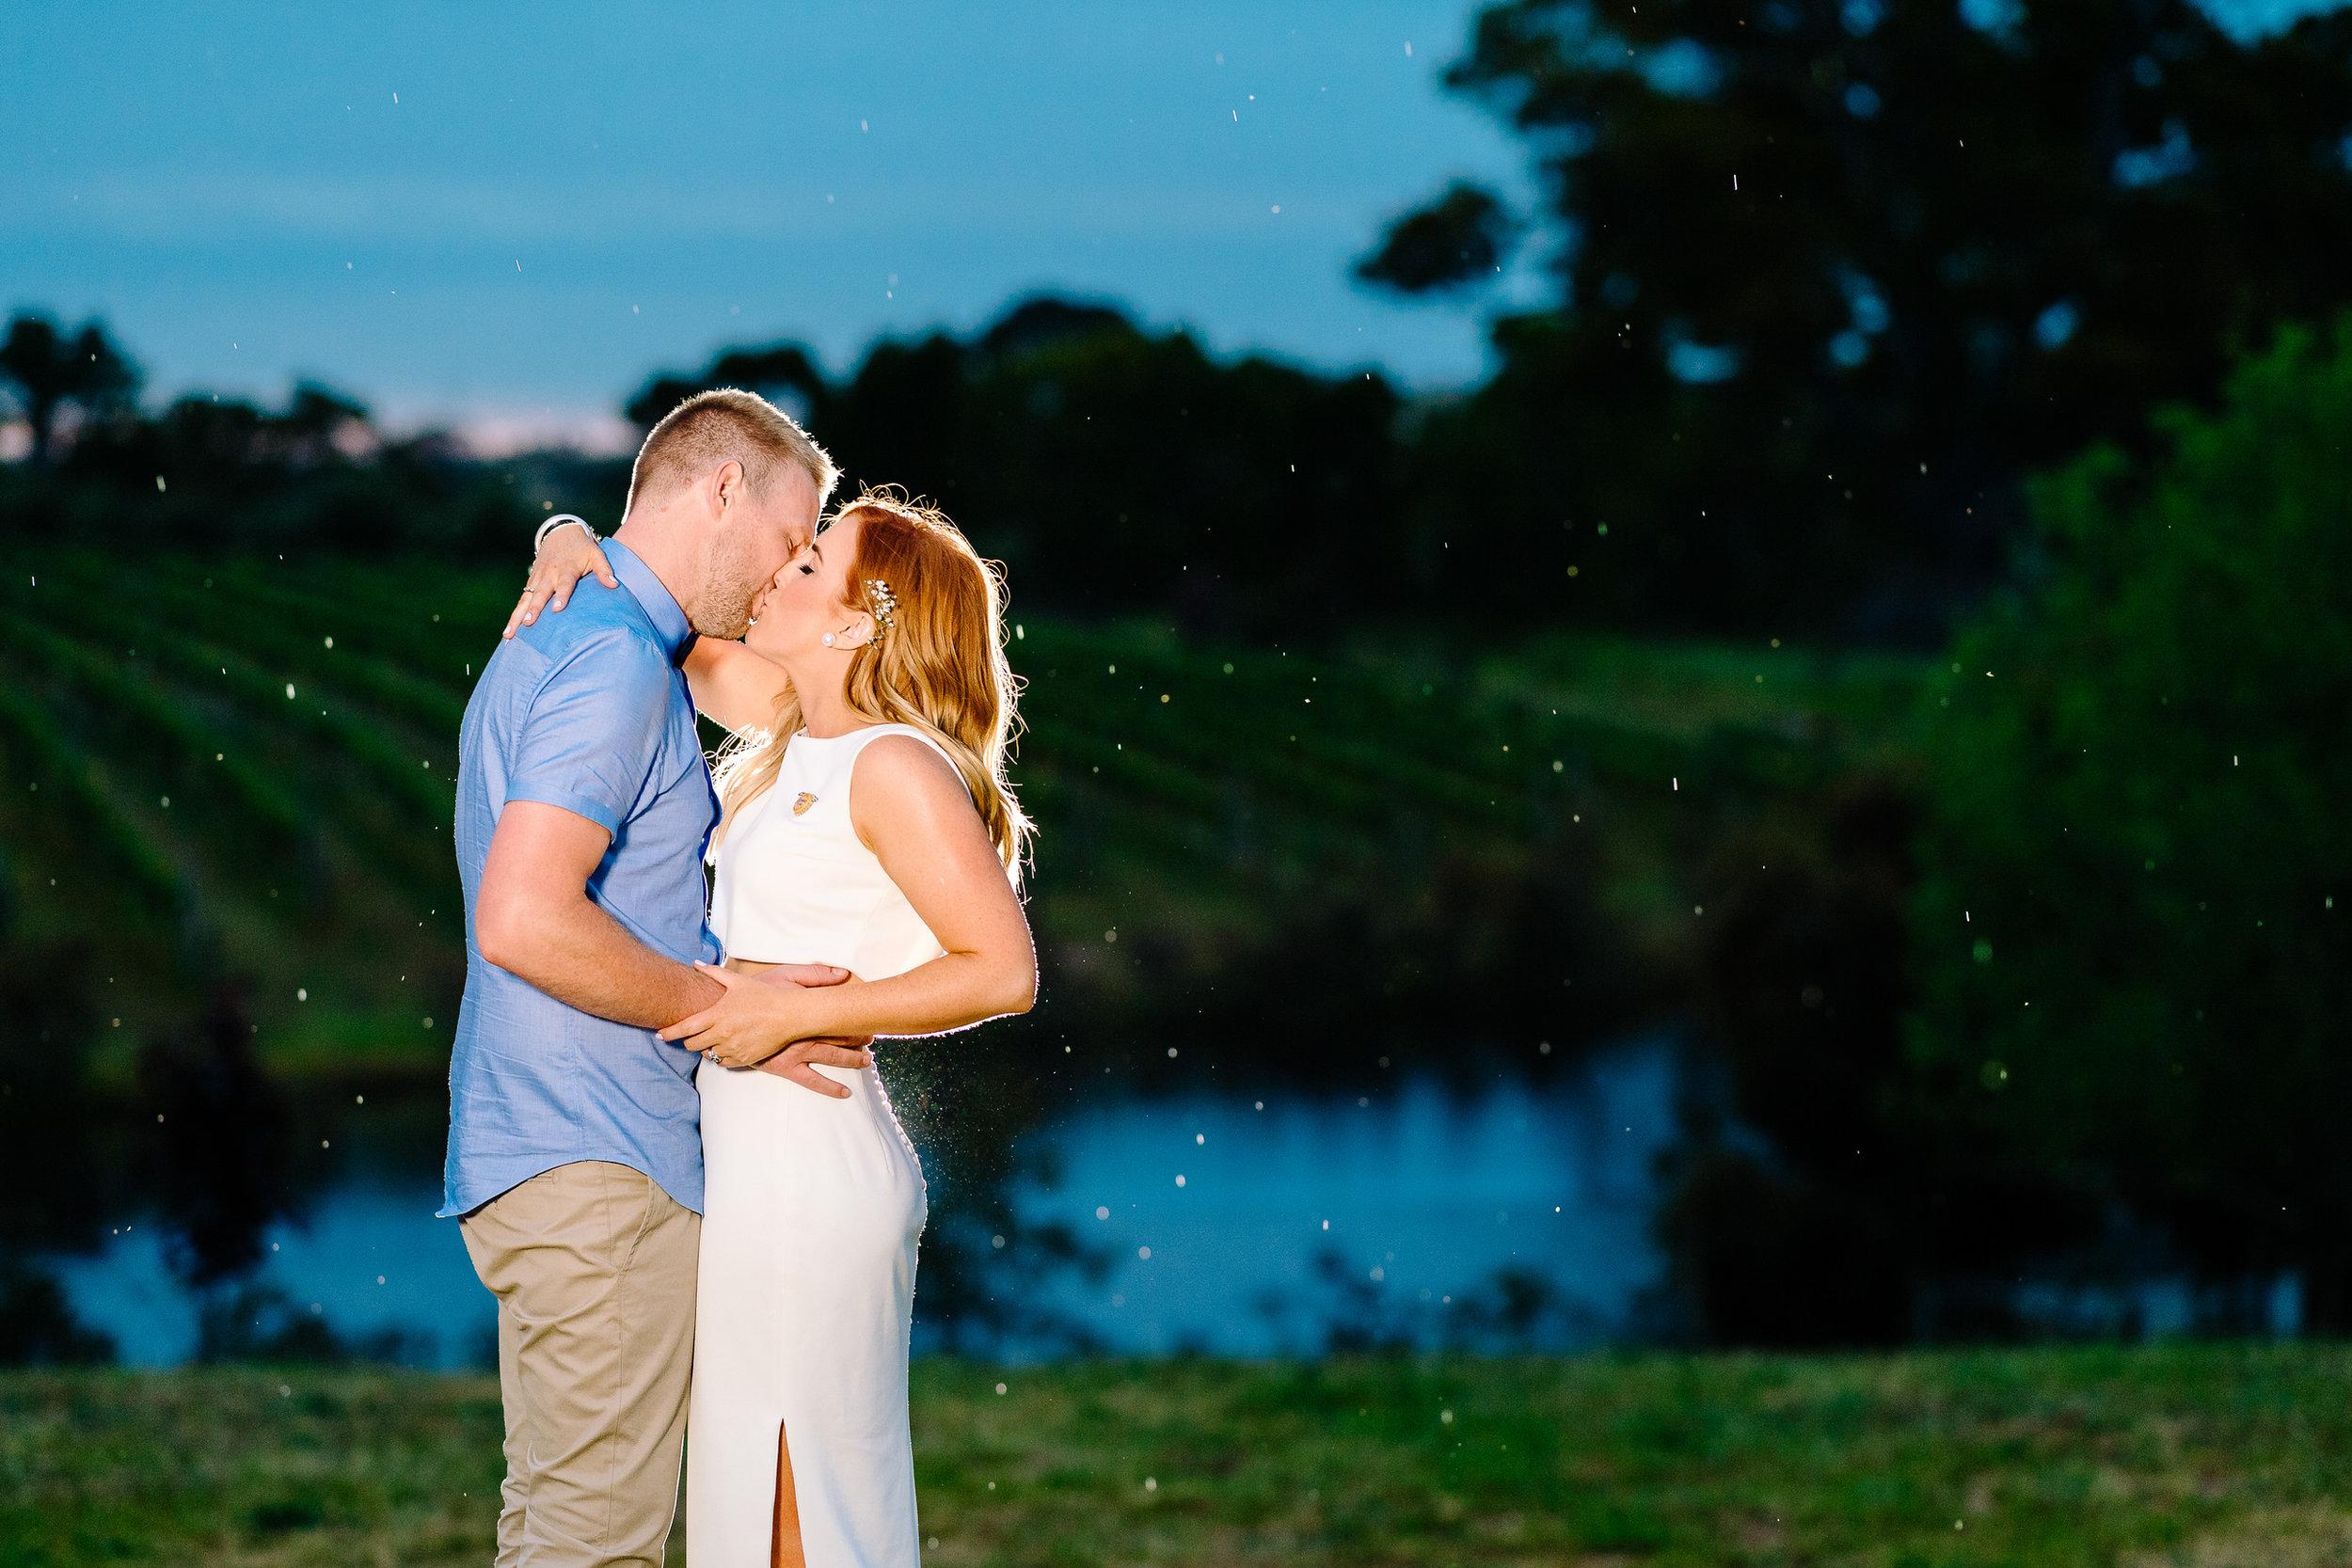 Bendigo_Wedding_Photography_Justin_Jim_BelvoirPark-266.JPG